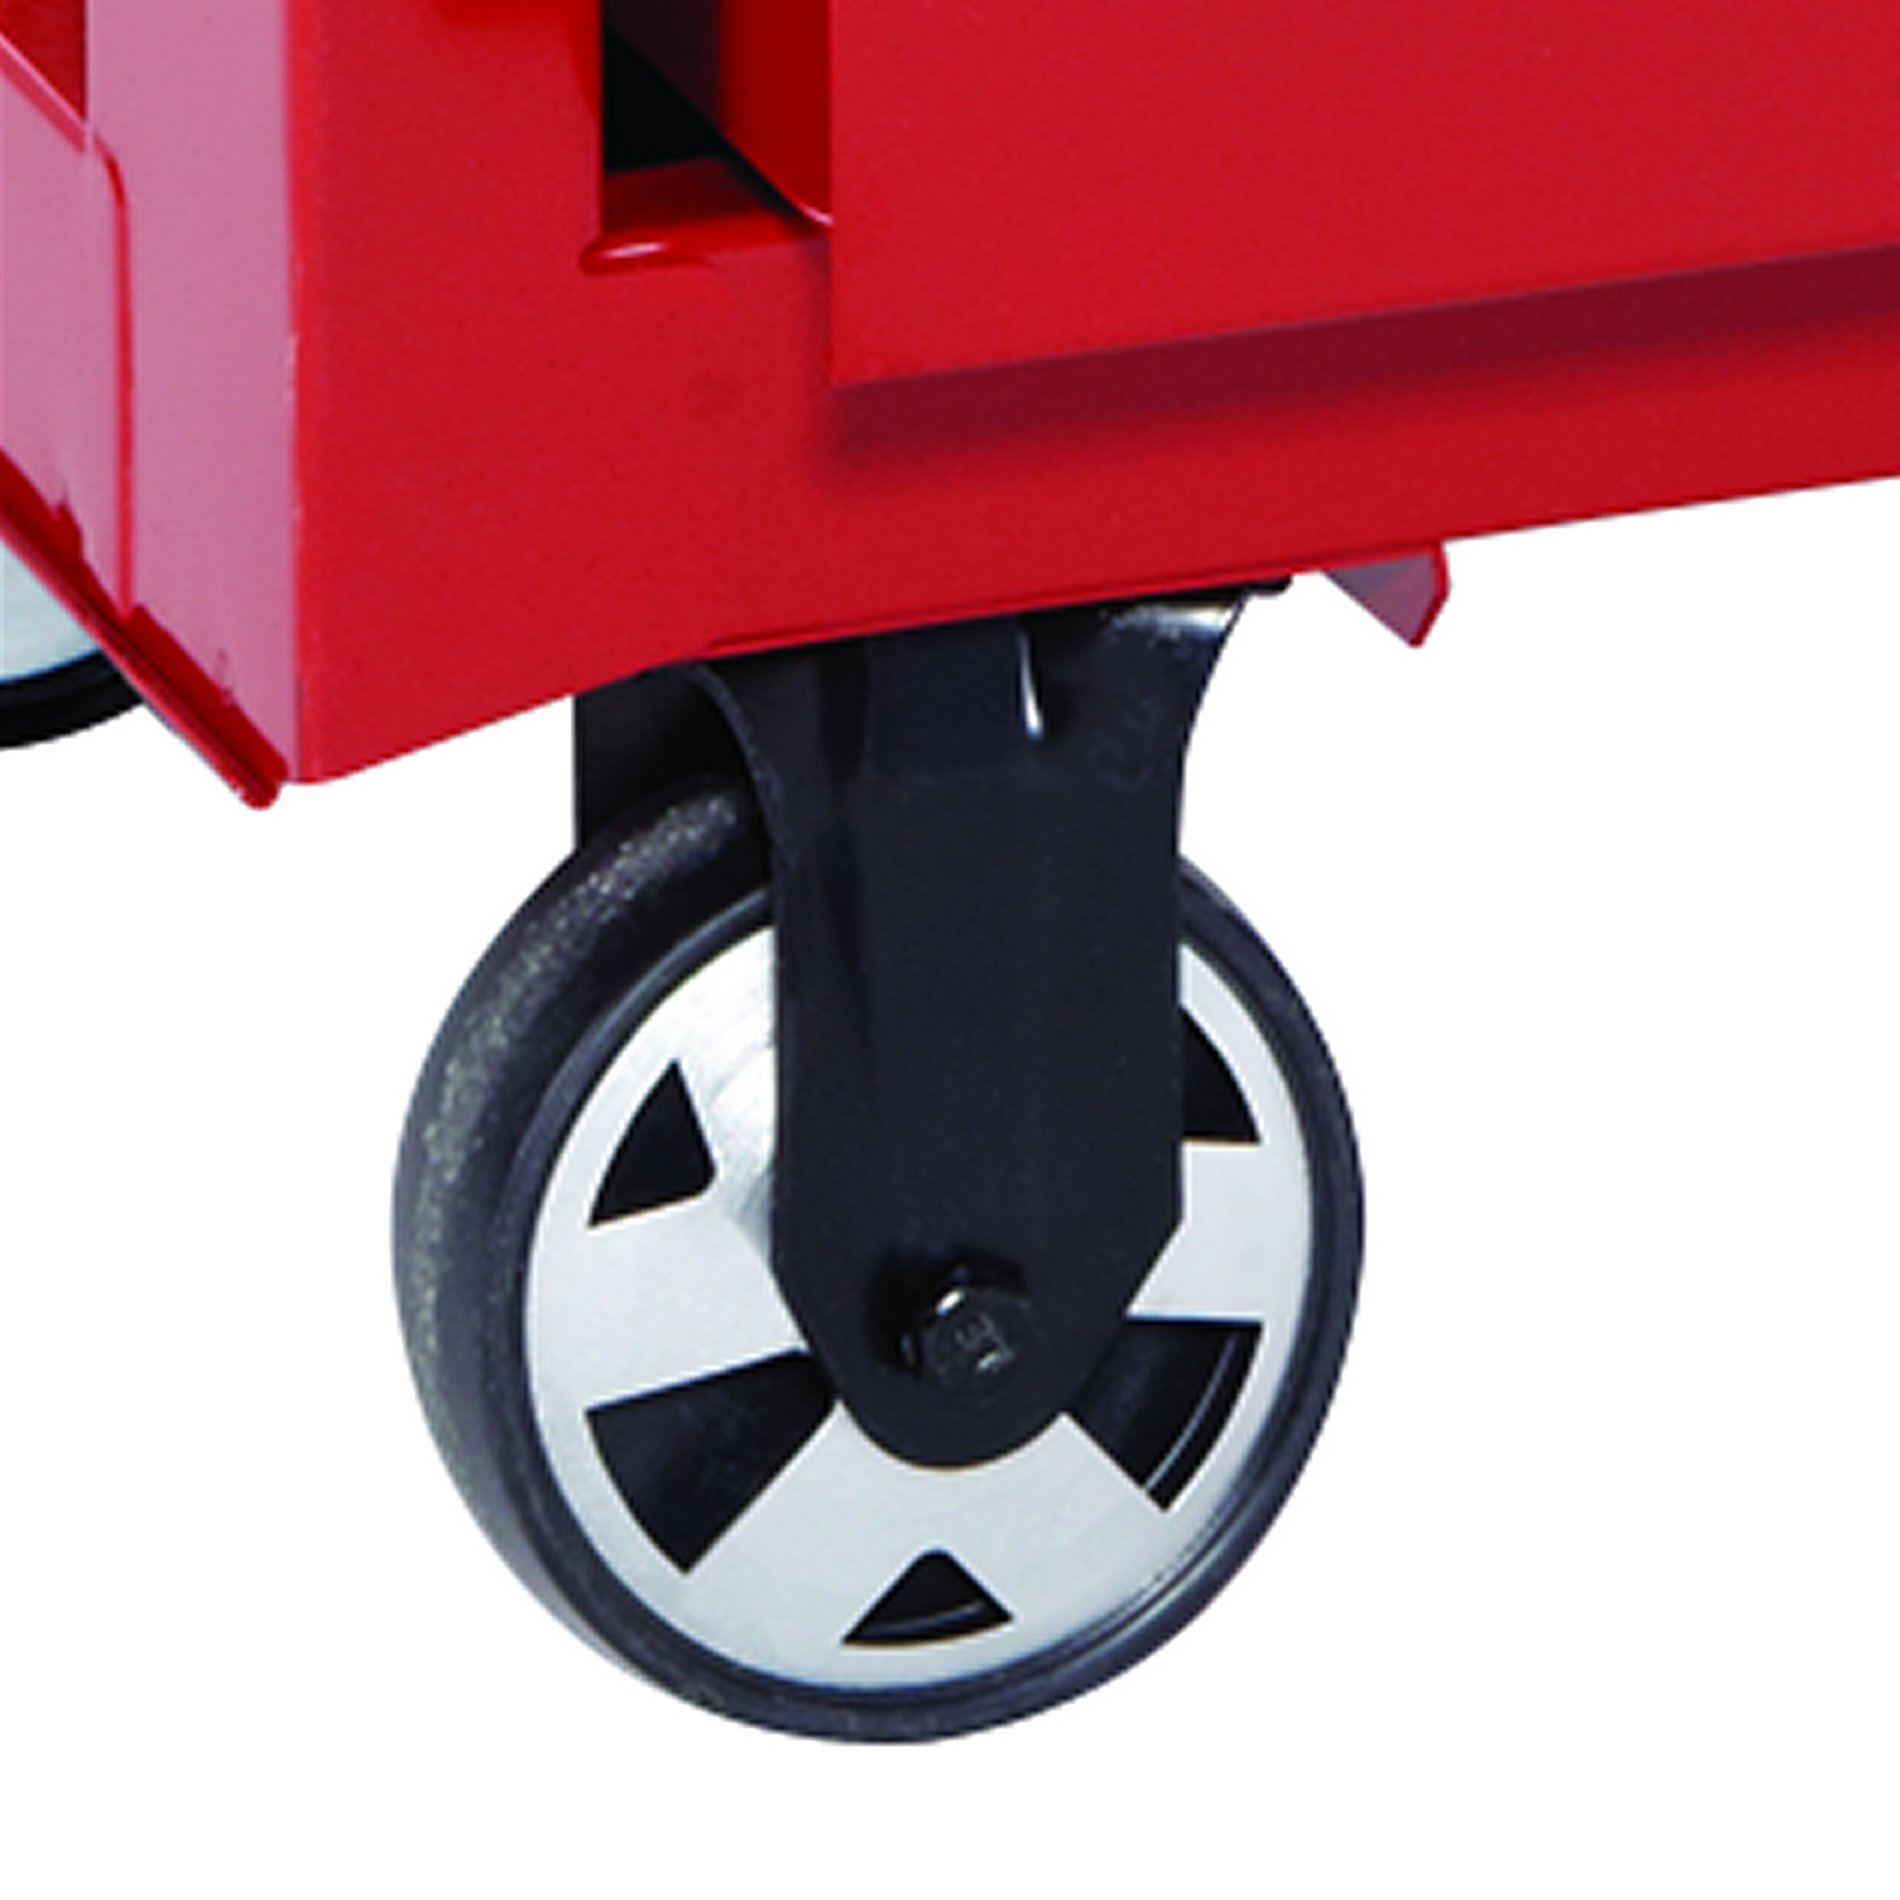 Craftsman 26 in. 4-Drawer Ball Bearing Griplatch Rolling Cabinet - Red